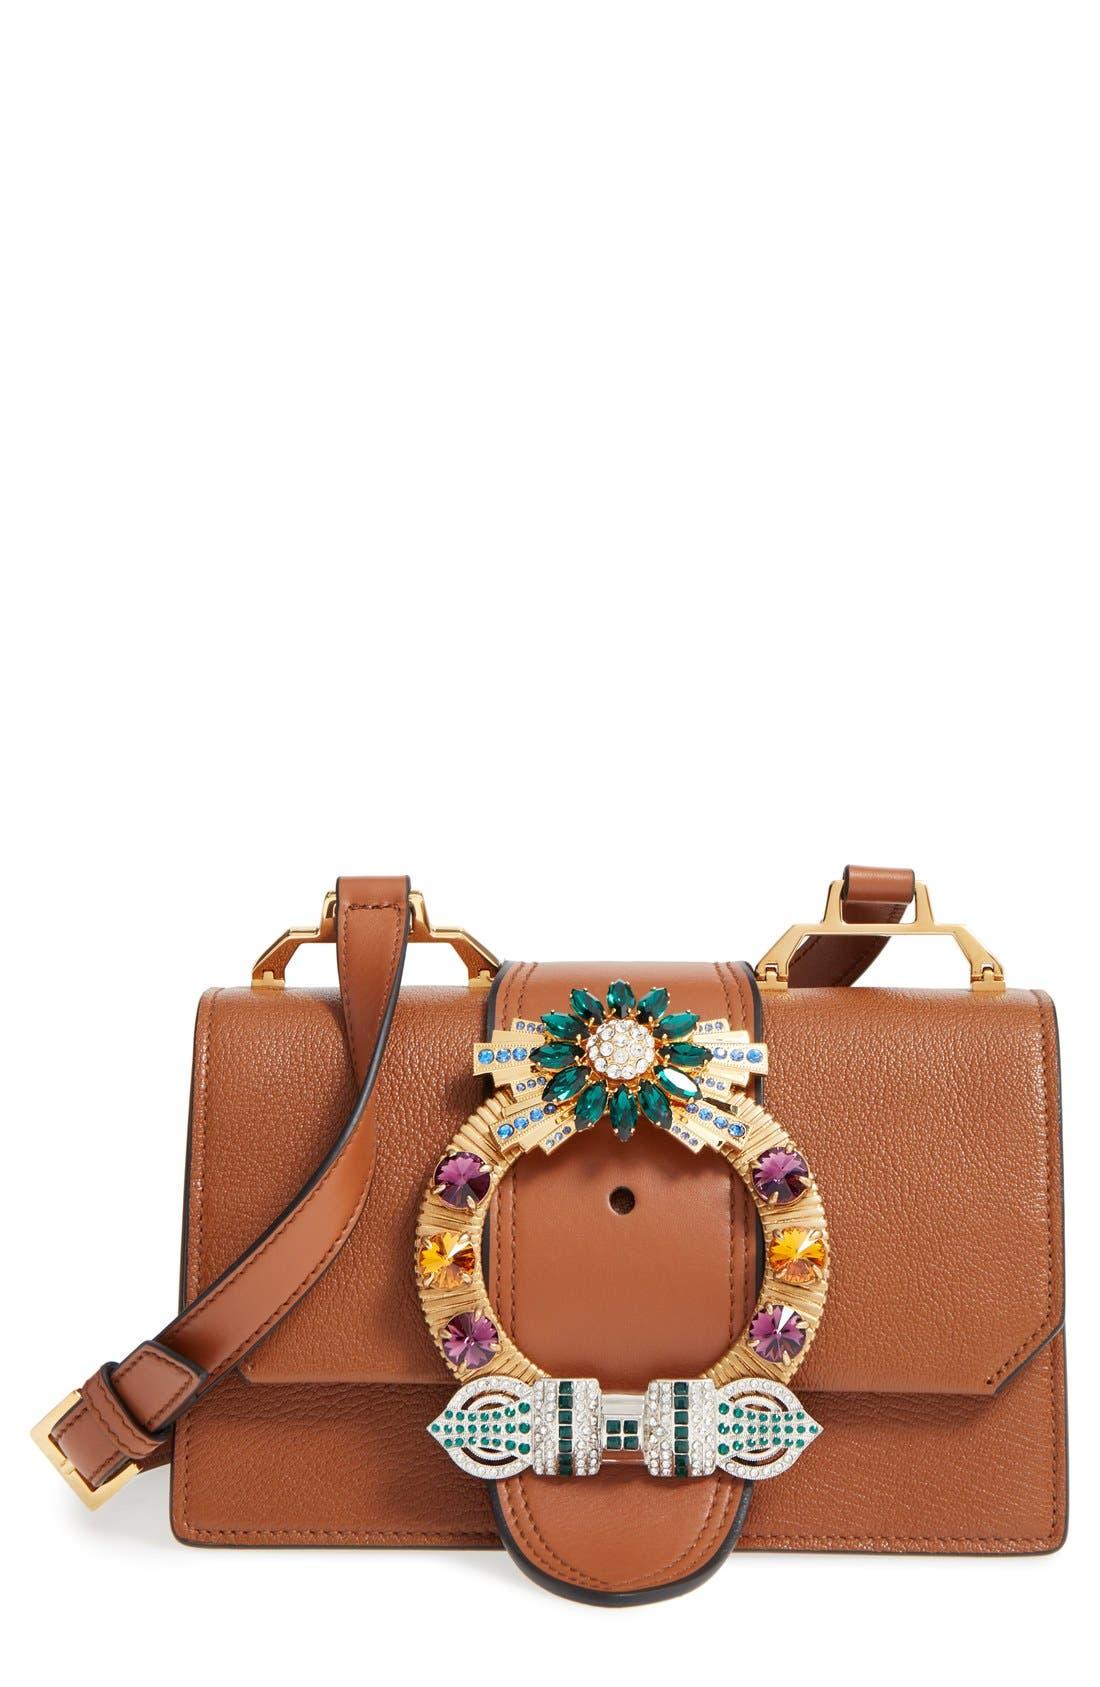 Main Image - Miu Miu 'Small Madras' Crystal Embellished Leather Shoulder Bag